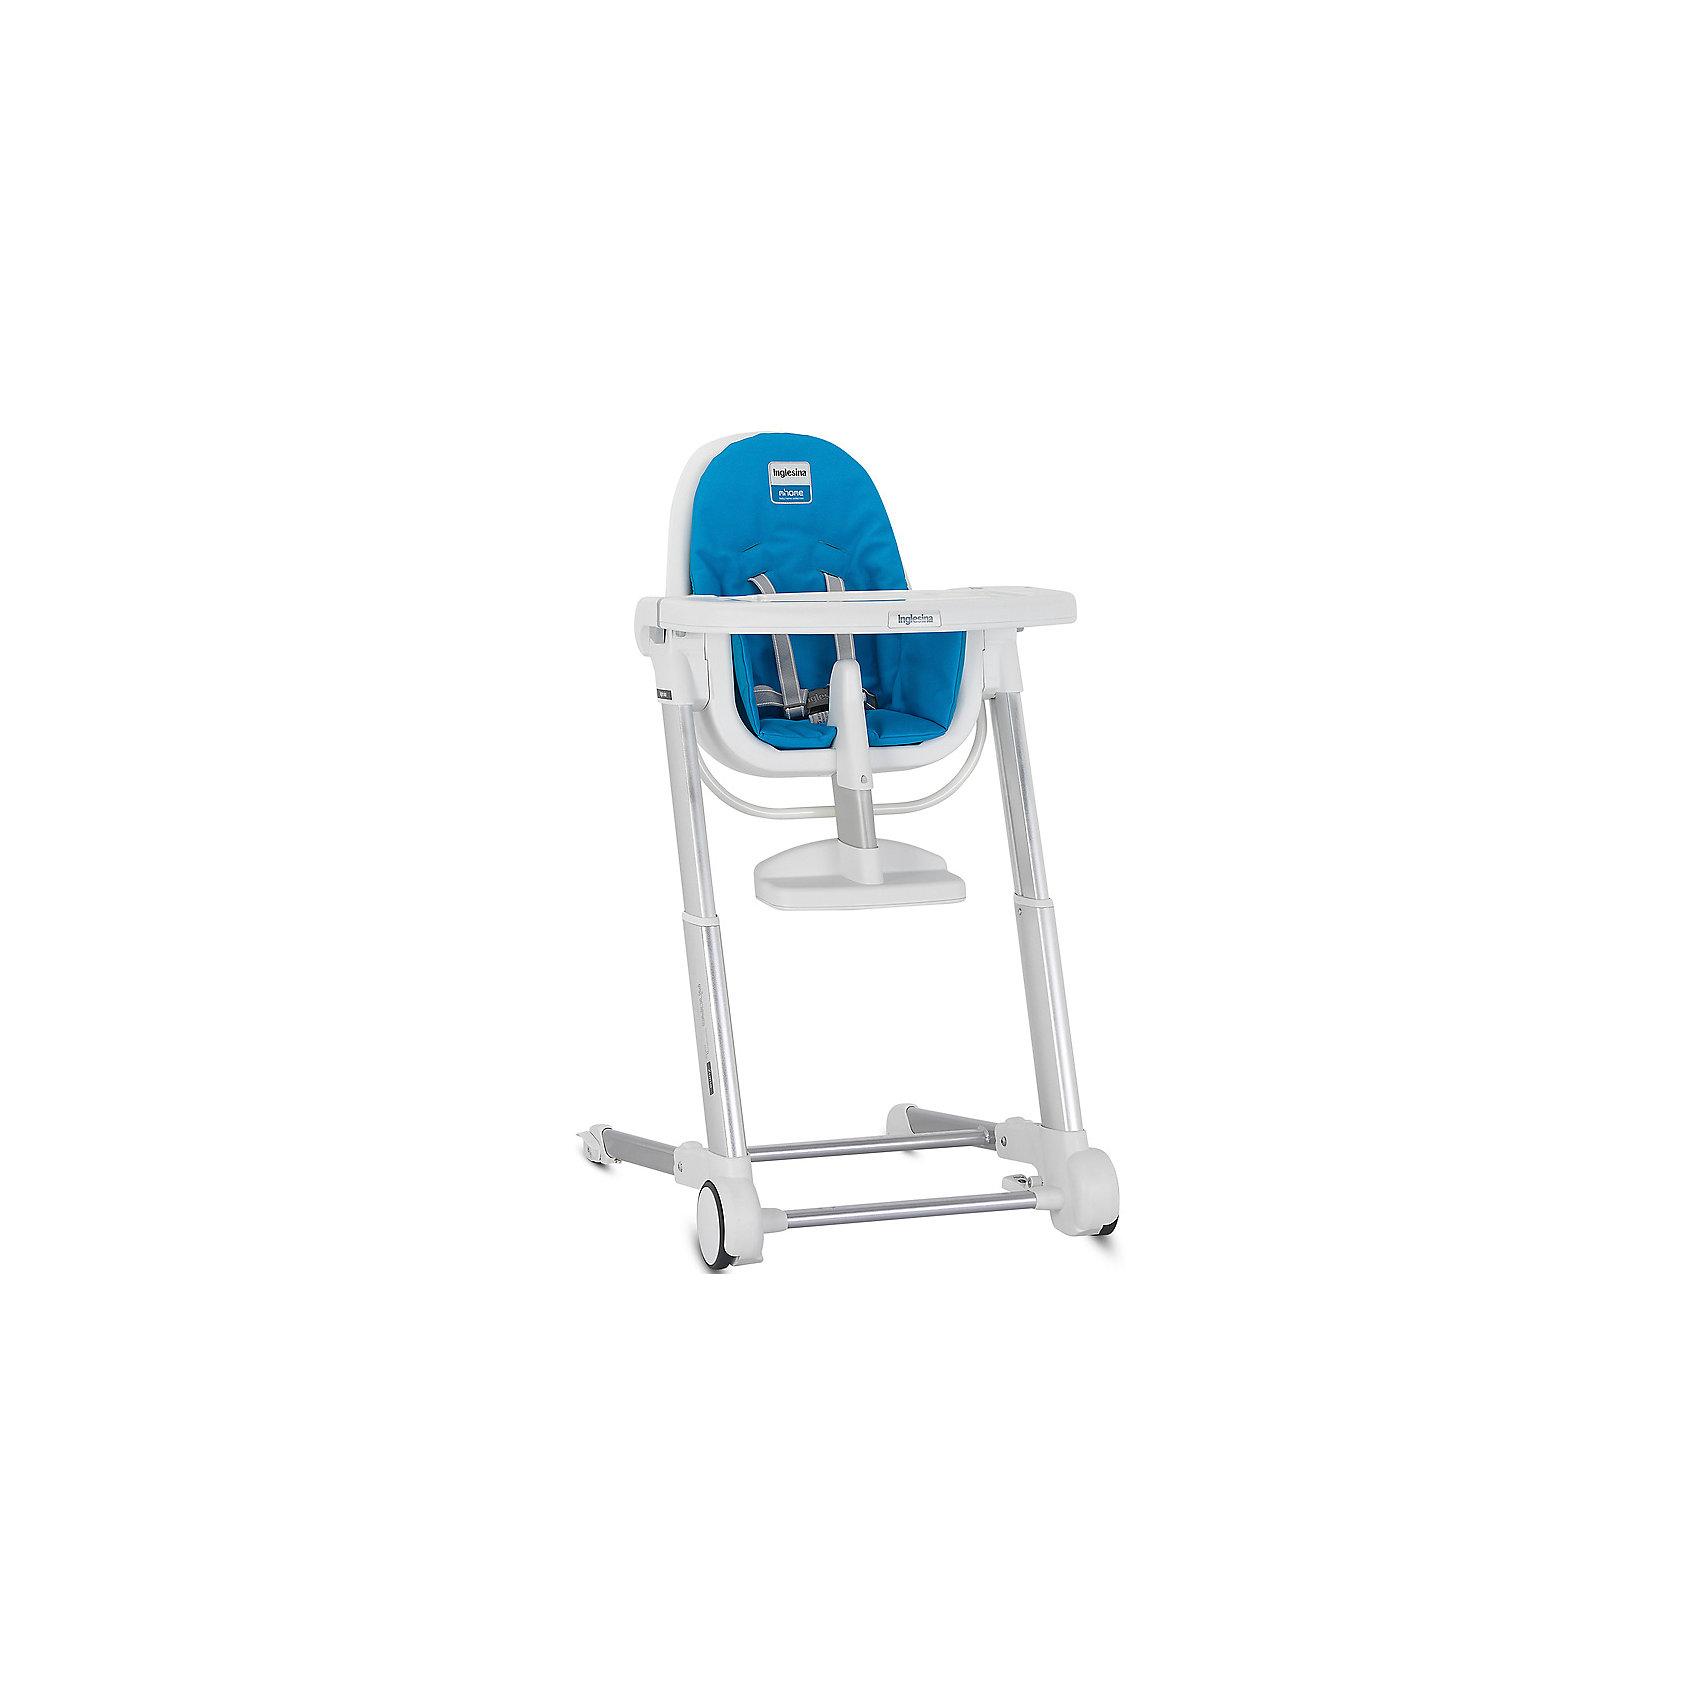 Inglesina Стульчик для кормления ZUMA, Inglesina, синий стул для кормления inglesina gusto ay94g3slf d